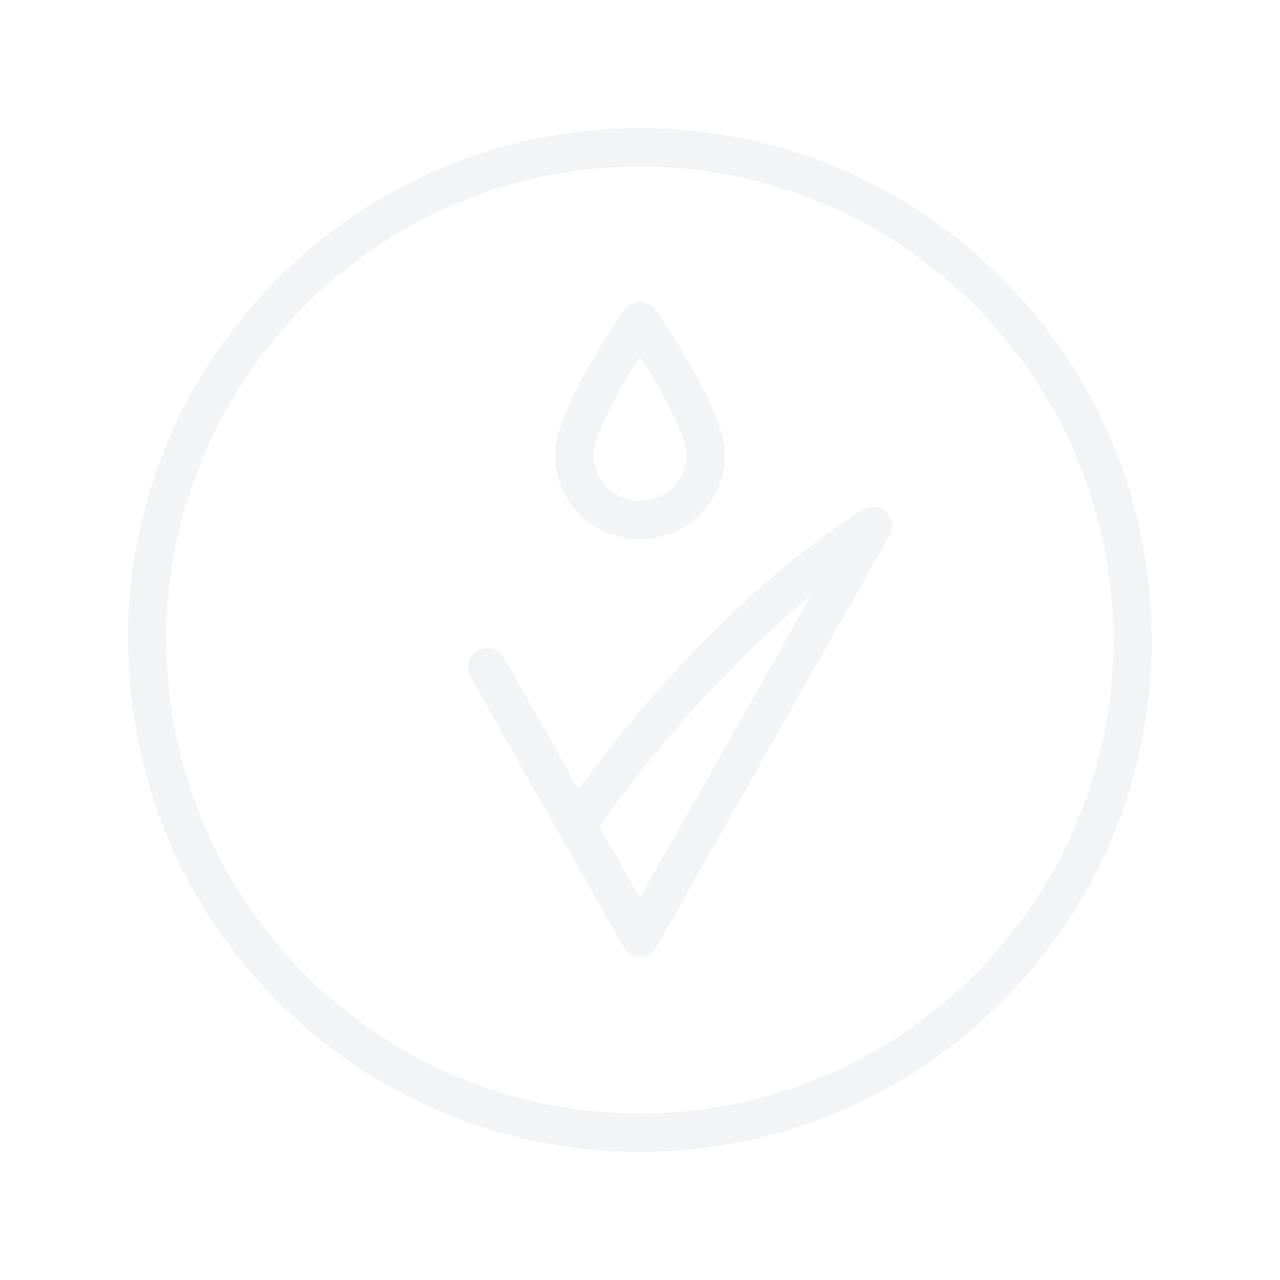 MINETAN Luxe Everyday Moisturizer Body Oil 300ml